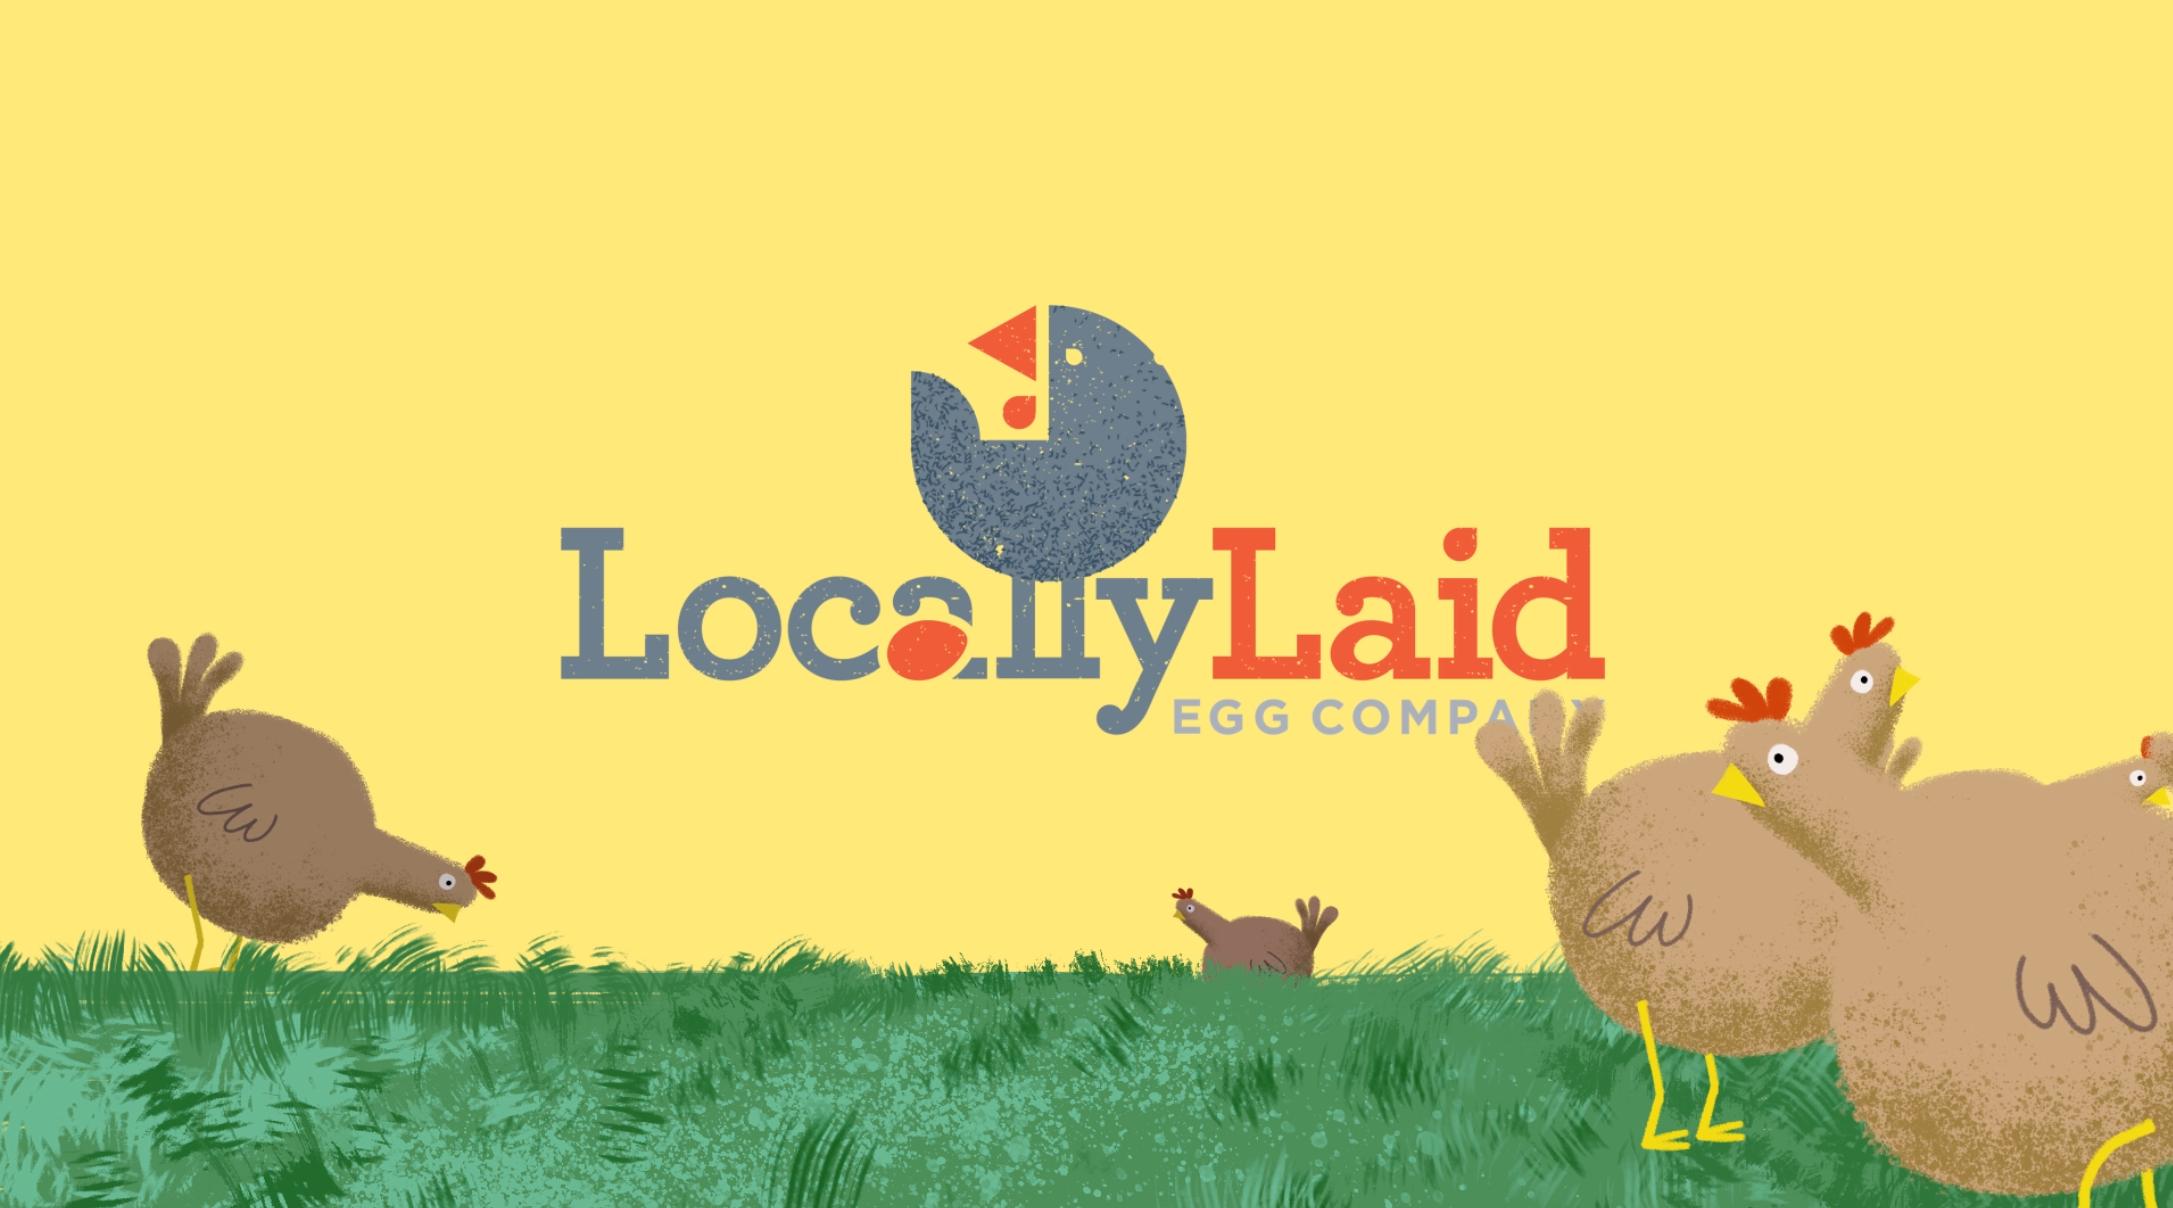 <a href='http://www.brianbarber.tv/animation/locally-laid-eggs-eggsplainer-video/'></a>